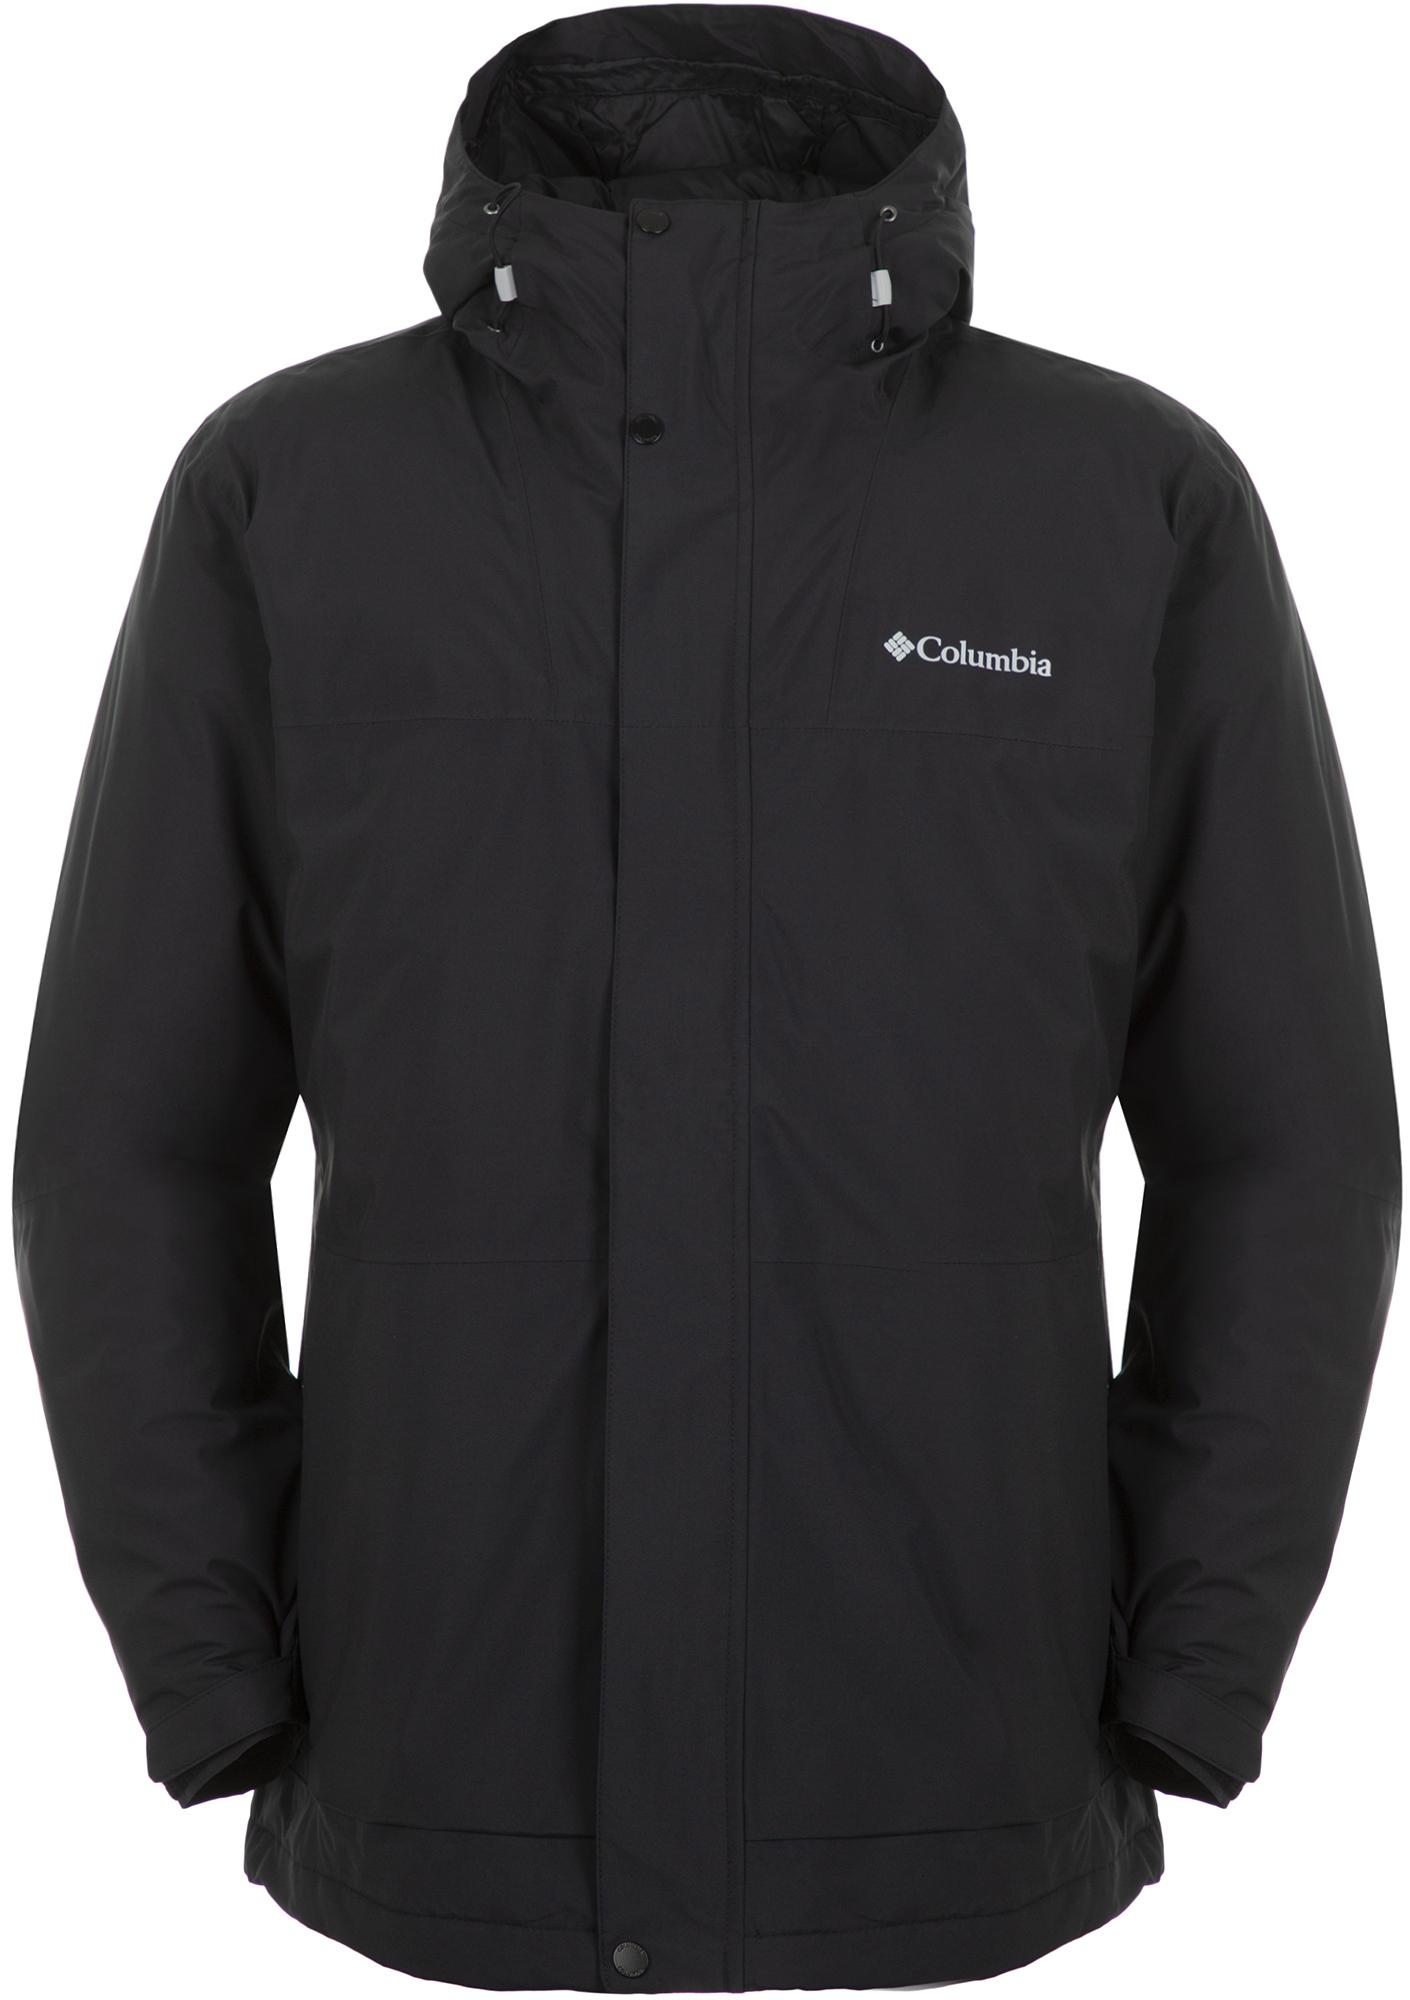 Columbia Куртка утепленная мужская Columbia Horizon Explorer, размер 56-58 цена и фото